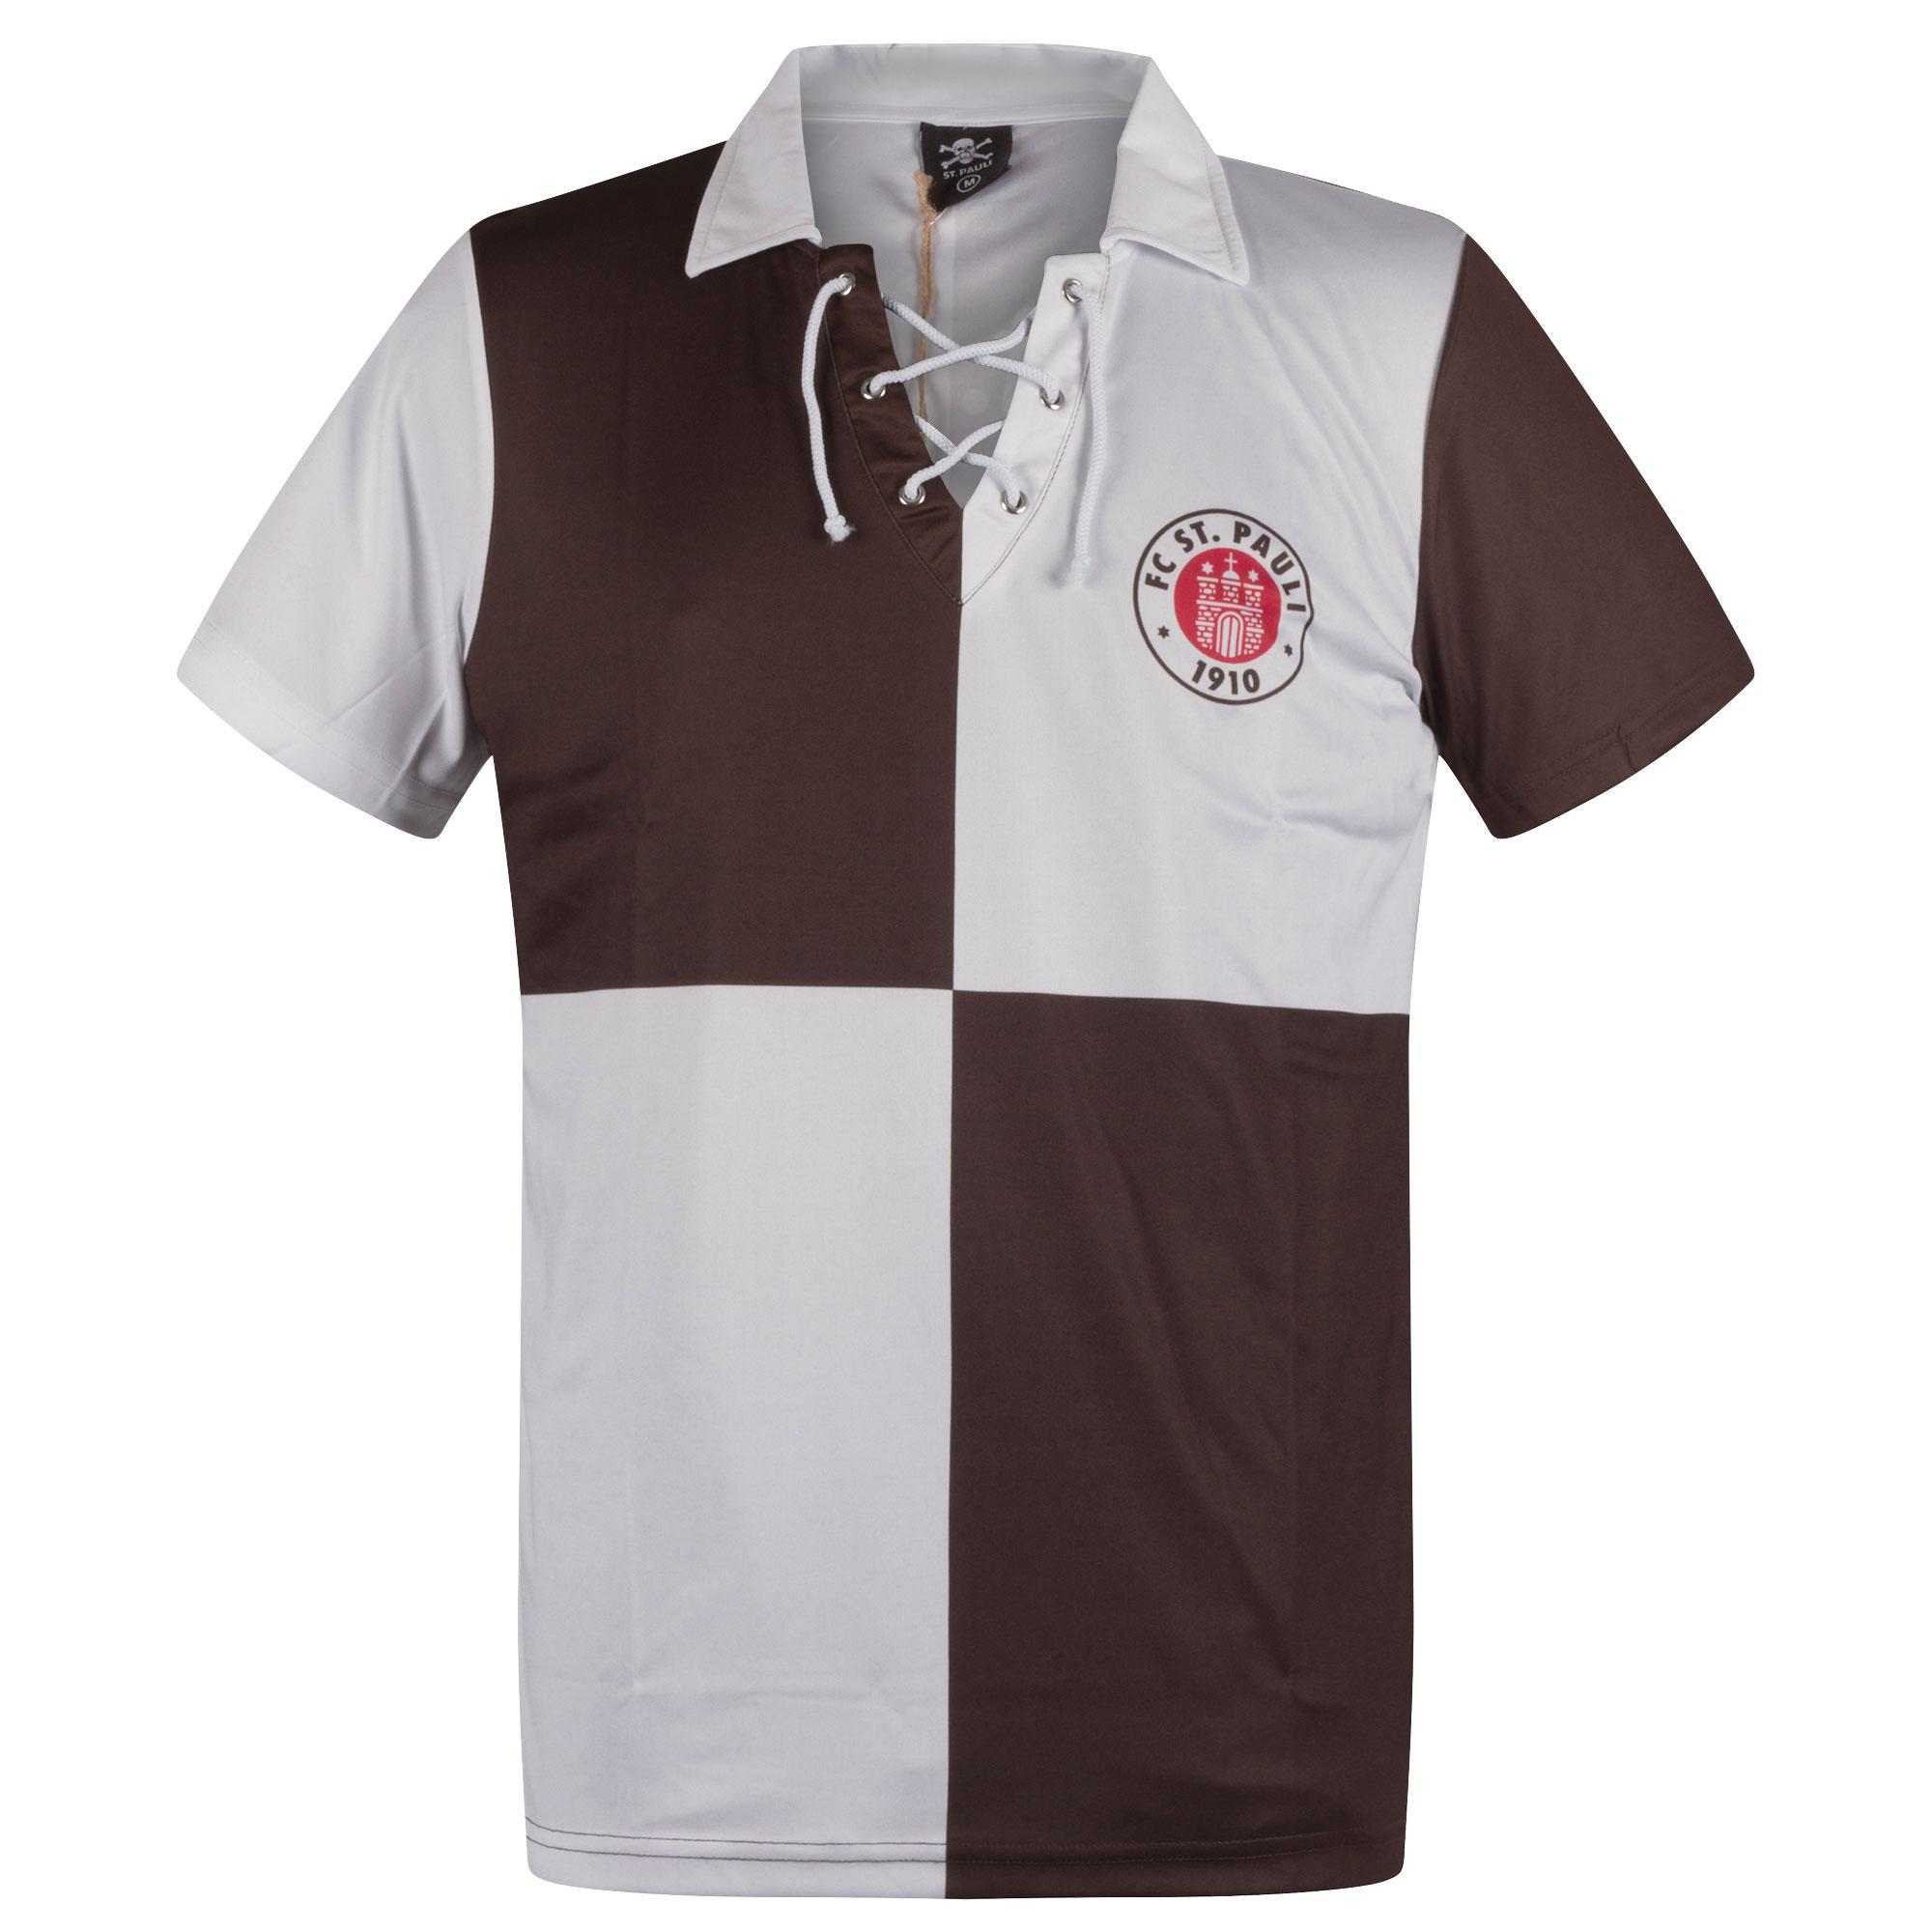 St Pauli Retro  shirt